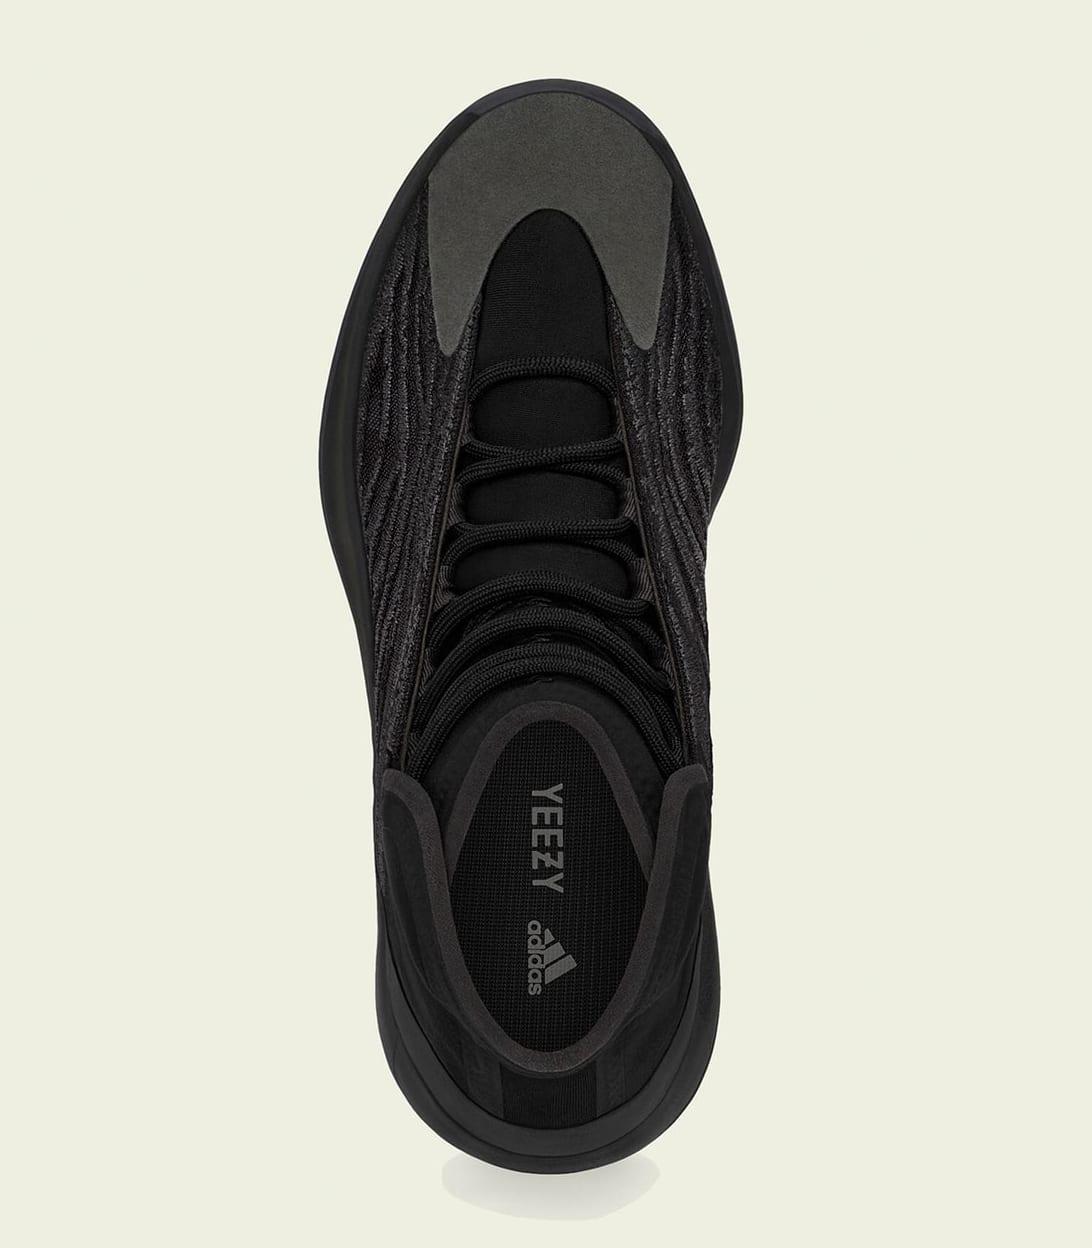 Adidas Yeezy Quantum 'Onyx' GX1317 Top